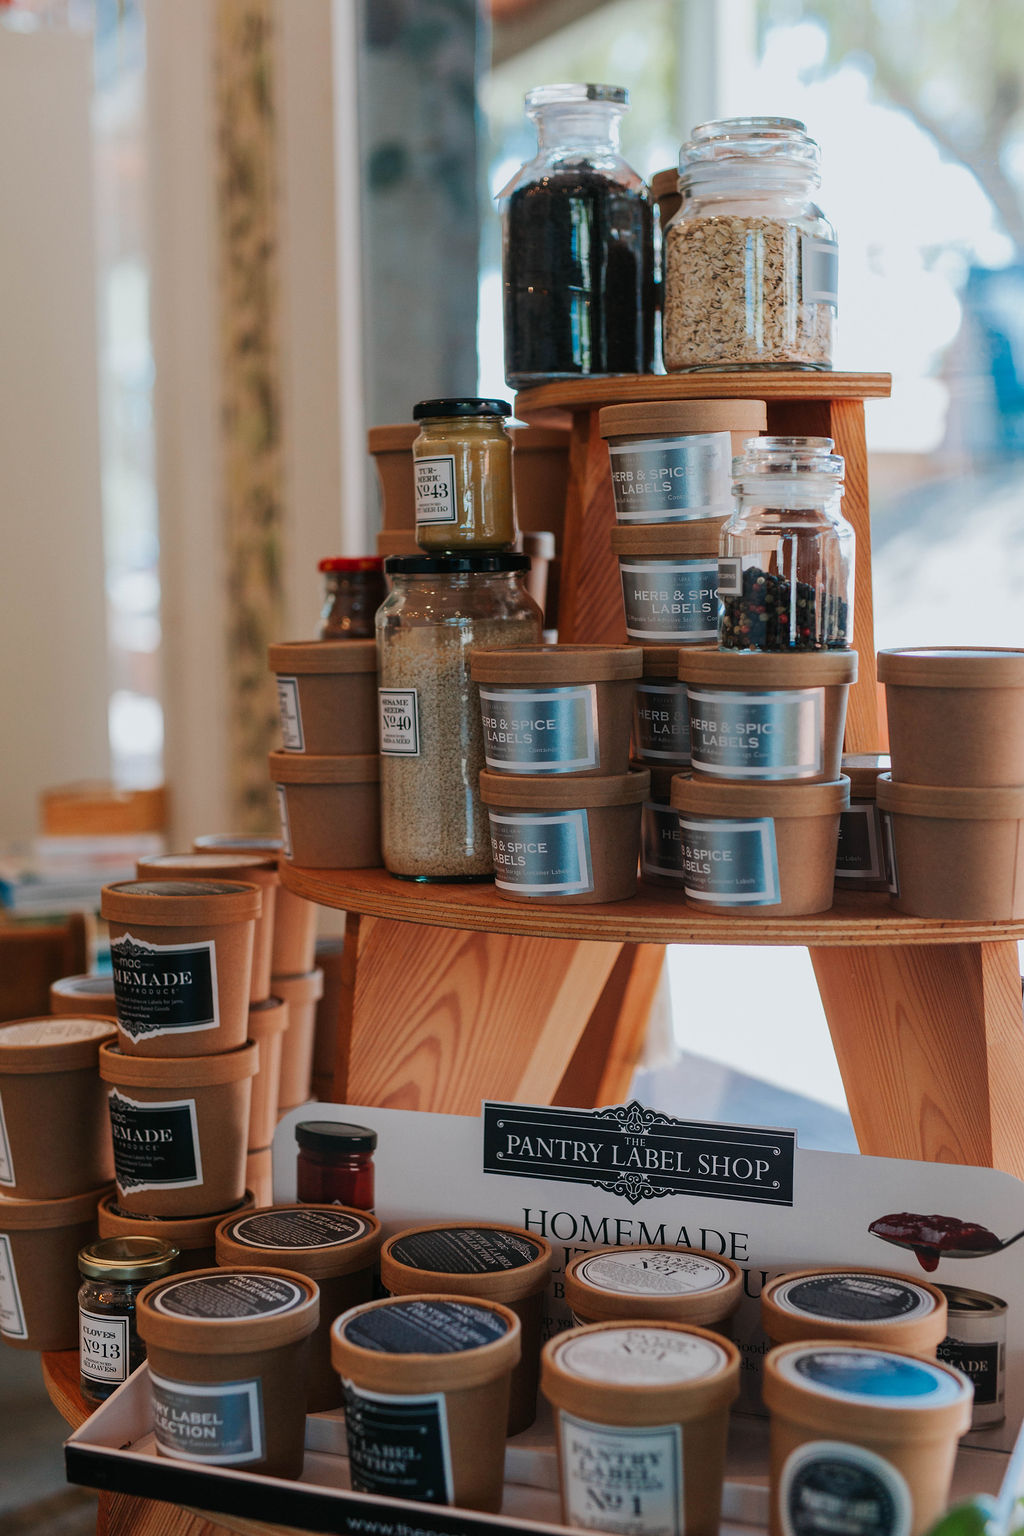 Replenish_Unpackaged_Living_Perth_Kalamunda_Waste_Free_Shopping_Bulk_Groceries_Sustainable_Zero_Wast_Wasteless_Goods_Whole_Foods_Plastic_Free_HOME_Gallery_13.jpg